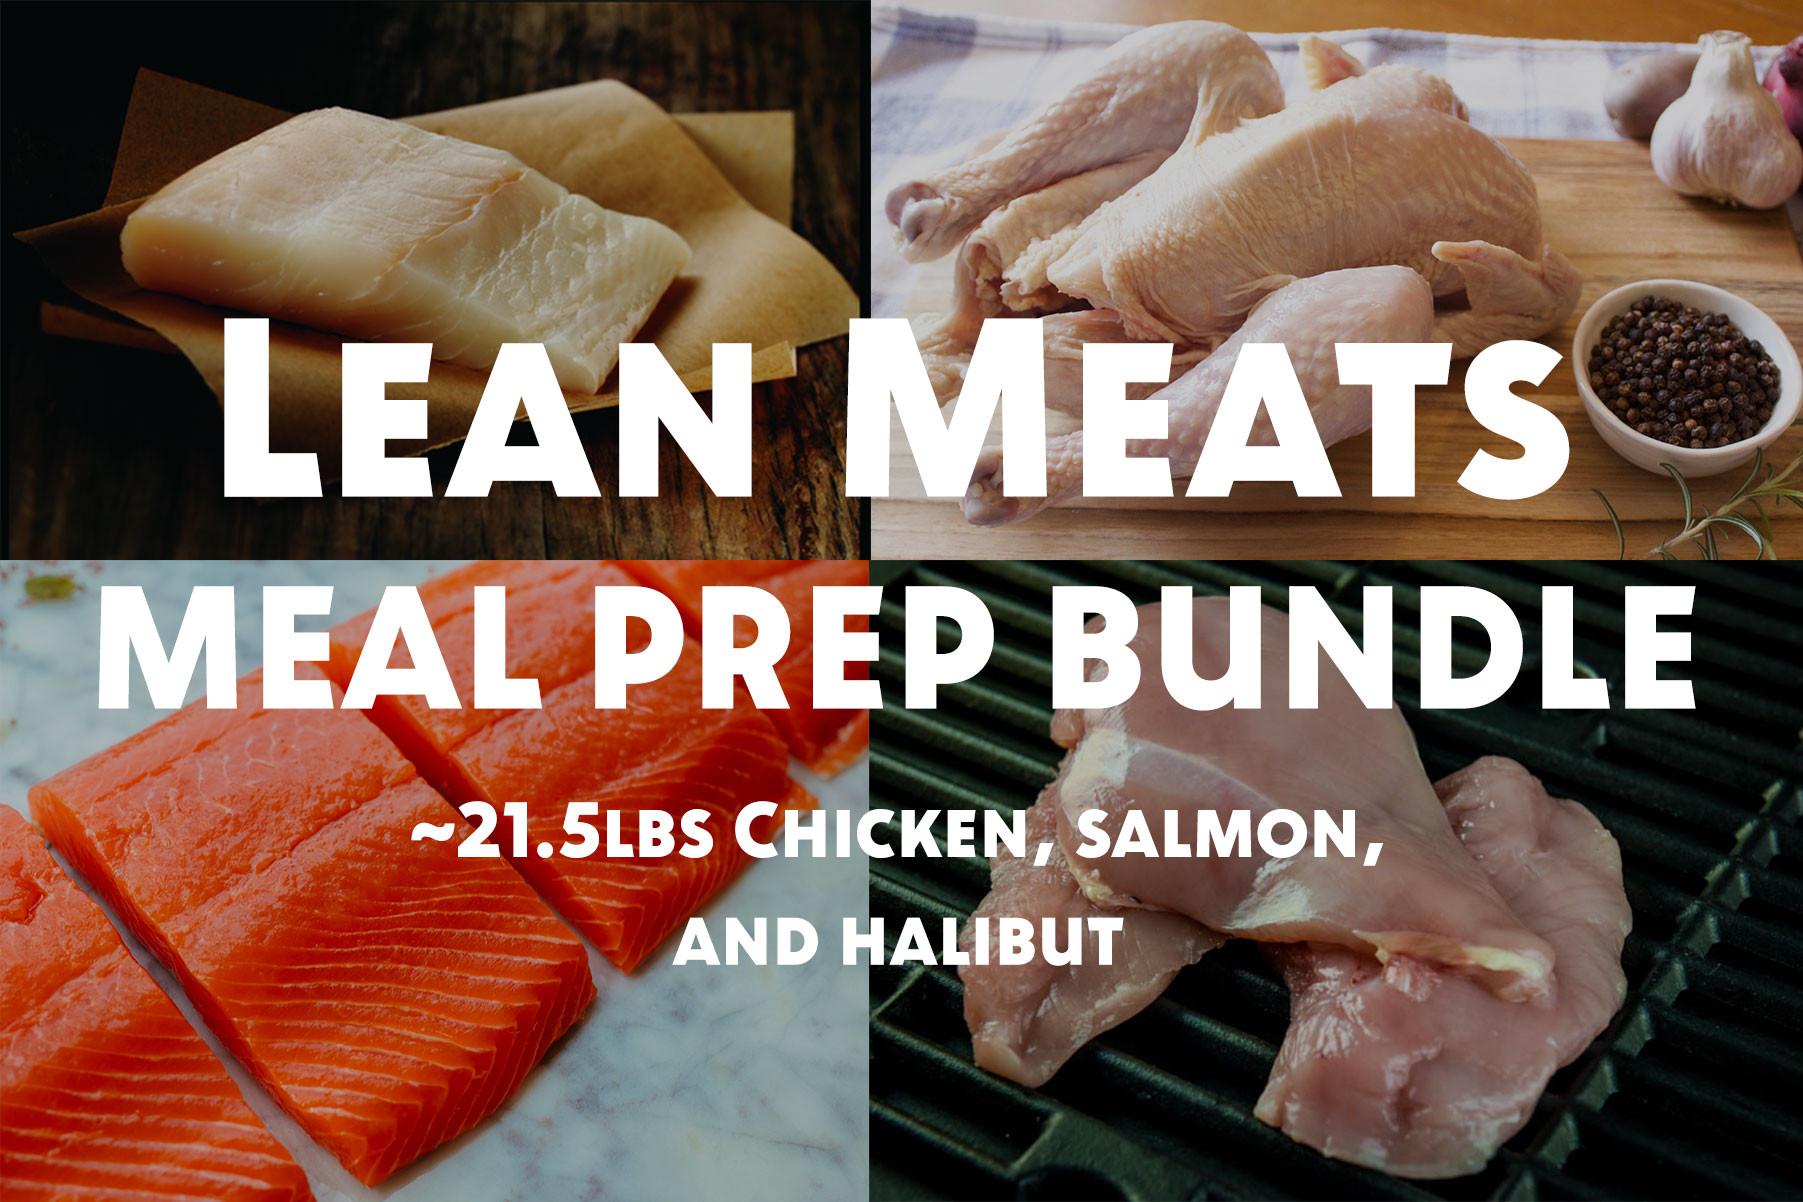 Lean Meats Meal Prep Bundle (Small)